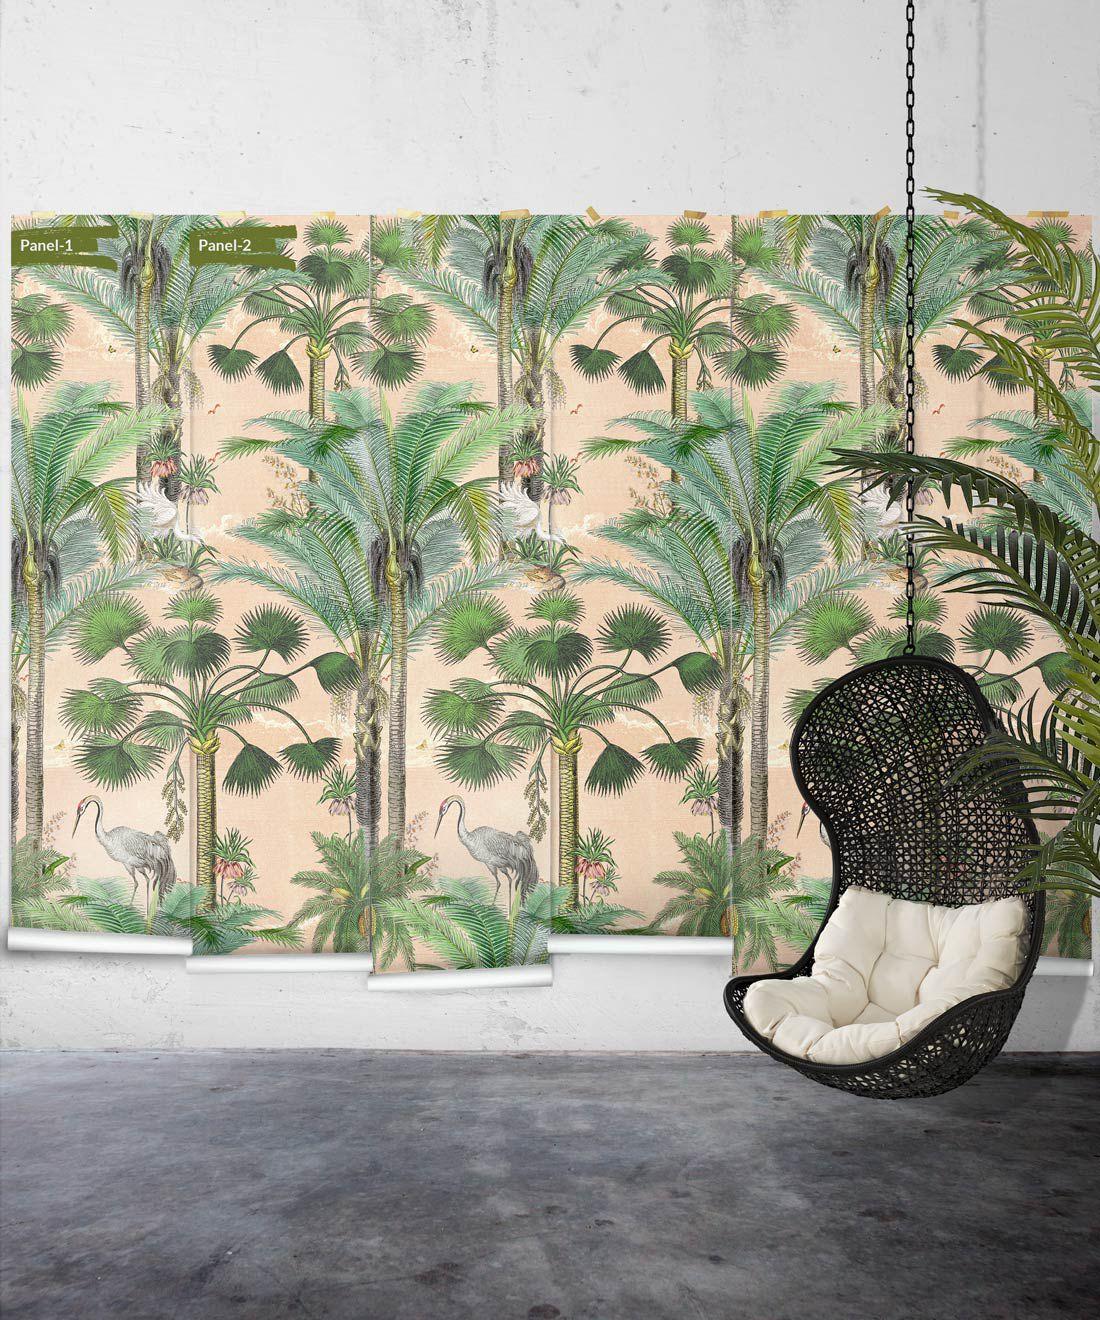 Kerala Palms Wallpaper Mural •Bethany Linz • Palm Tree Mural • Pink • Panels